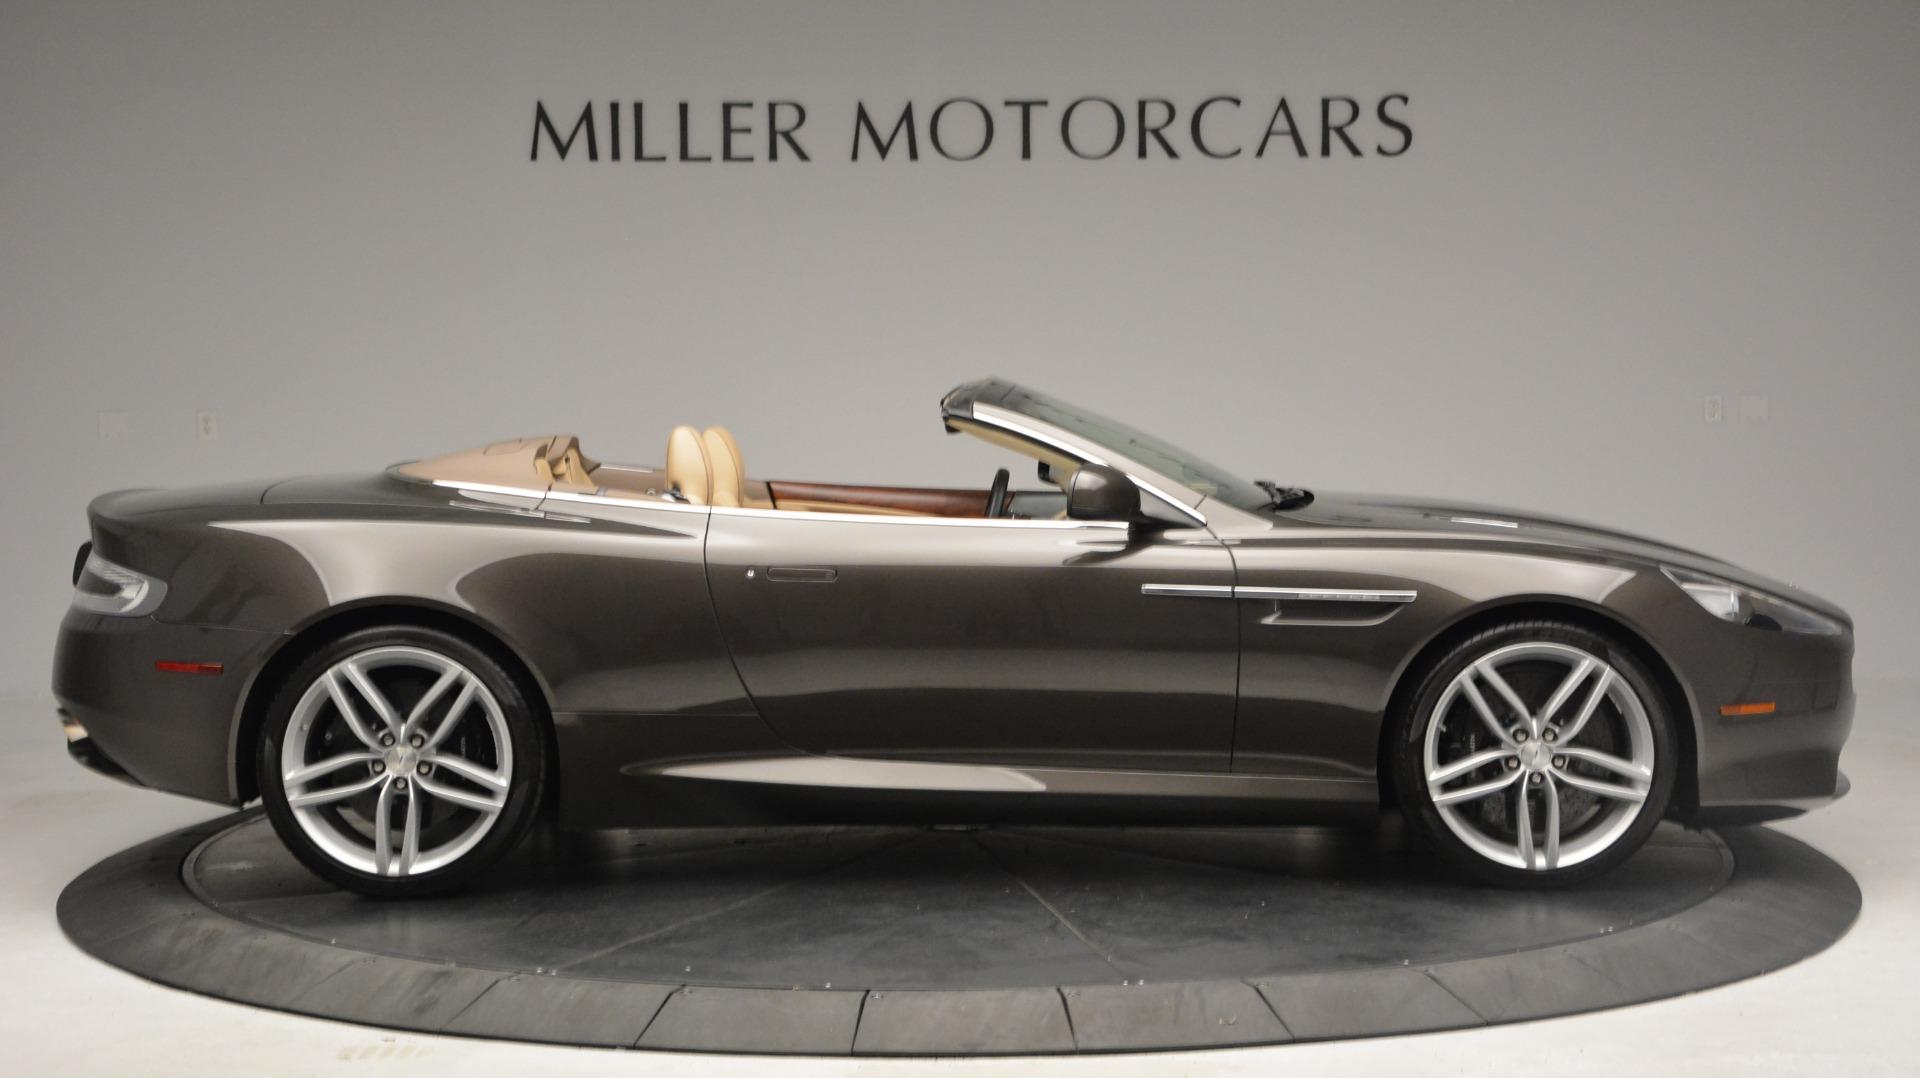 Used 2012 Aston Martin Virage Convertible For Sale In Greenwich, CT. Alfa Romeo of Greenwich, 7613 3351_p9